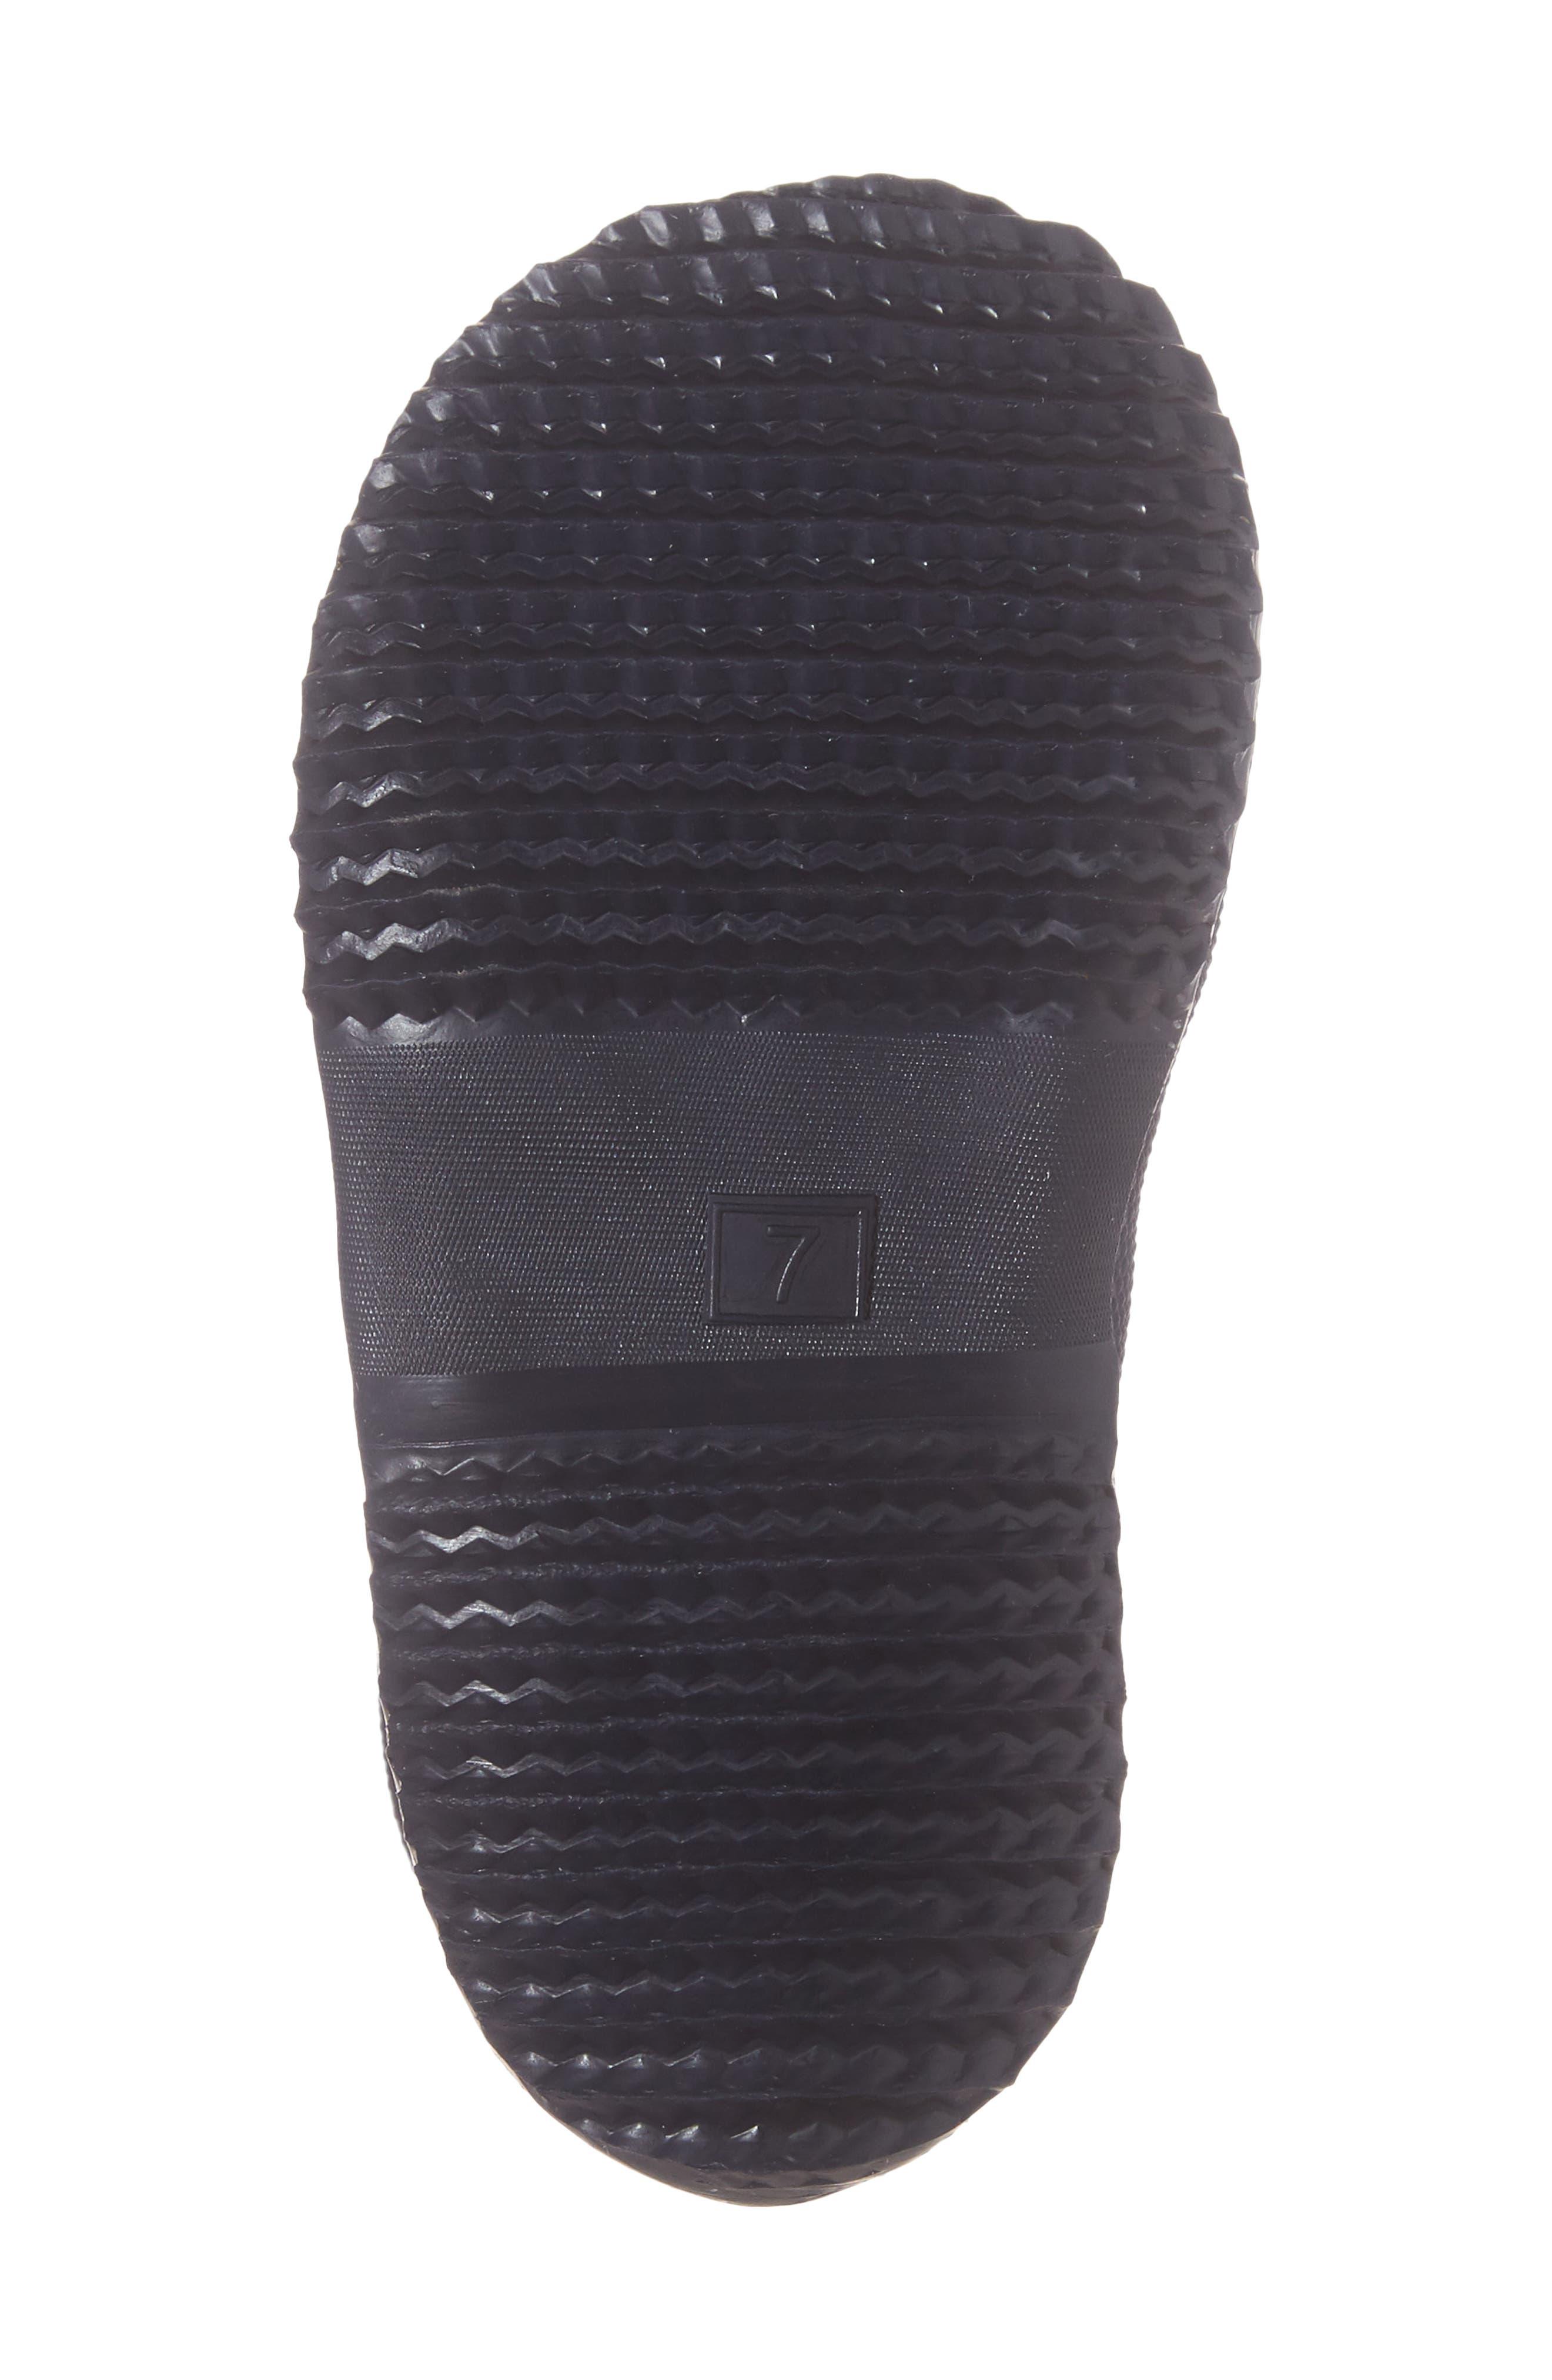 Printed Waterproof Rain Boot,                             Alternate thumbnail 6, color,                             Multi Bear Camo